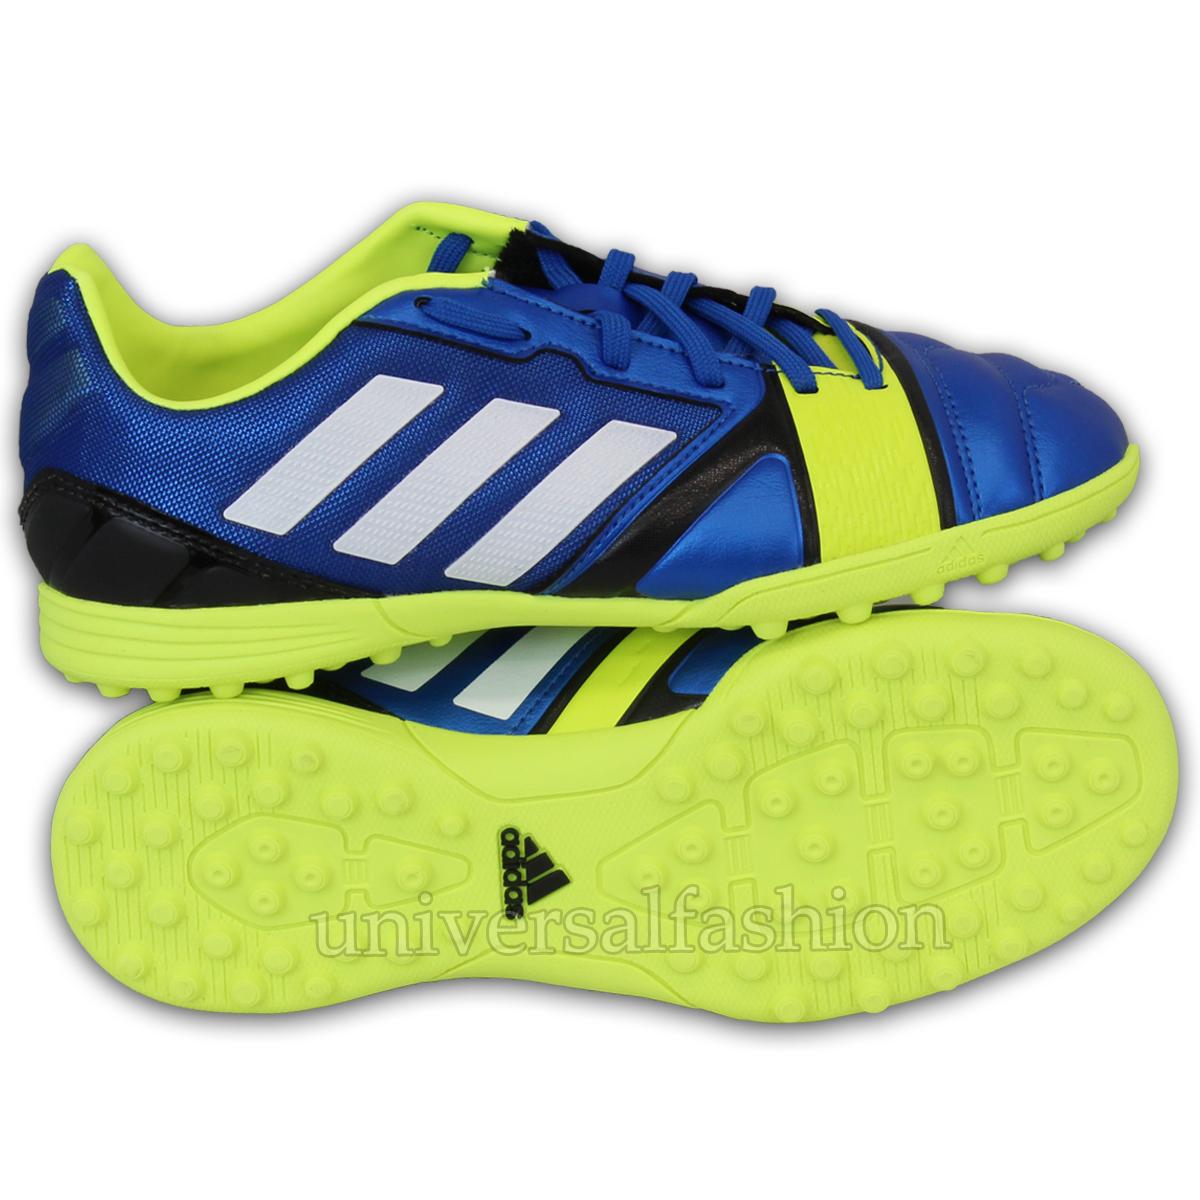 Adaidas Soccer Kids Turf Shoes